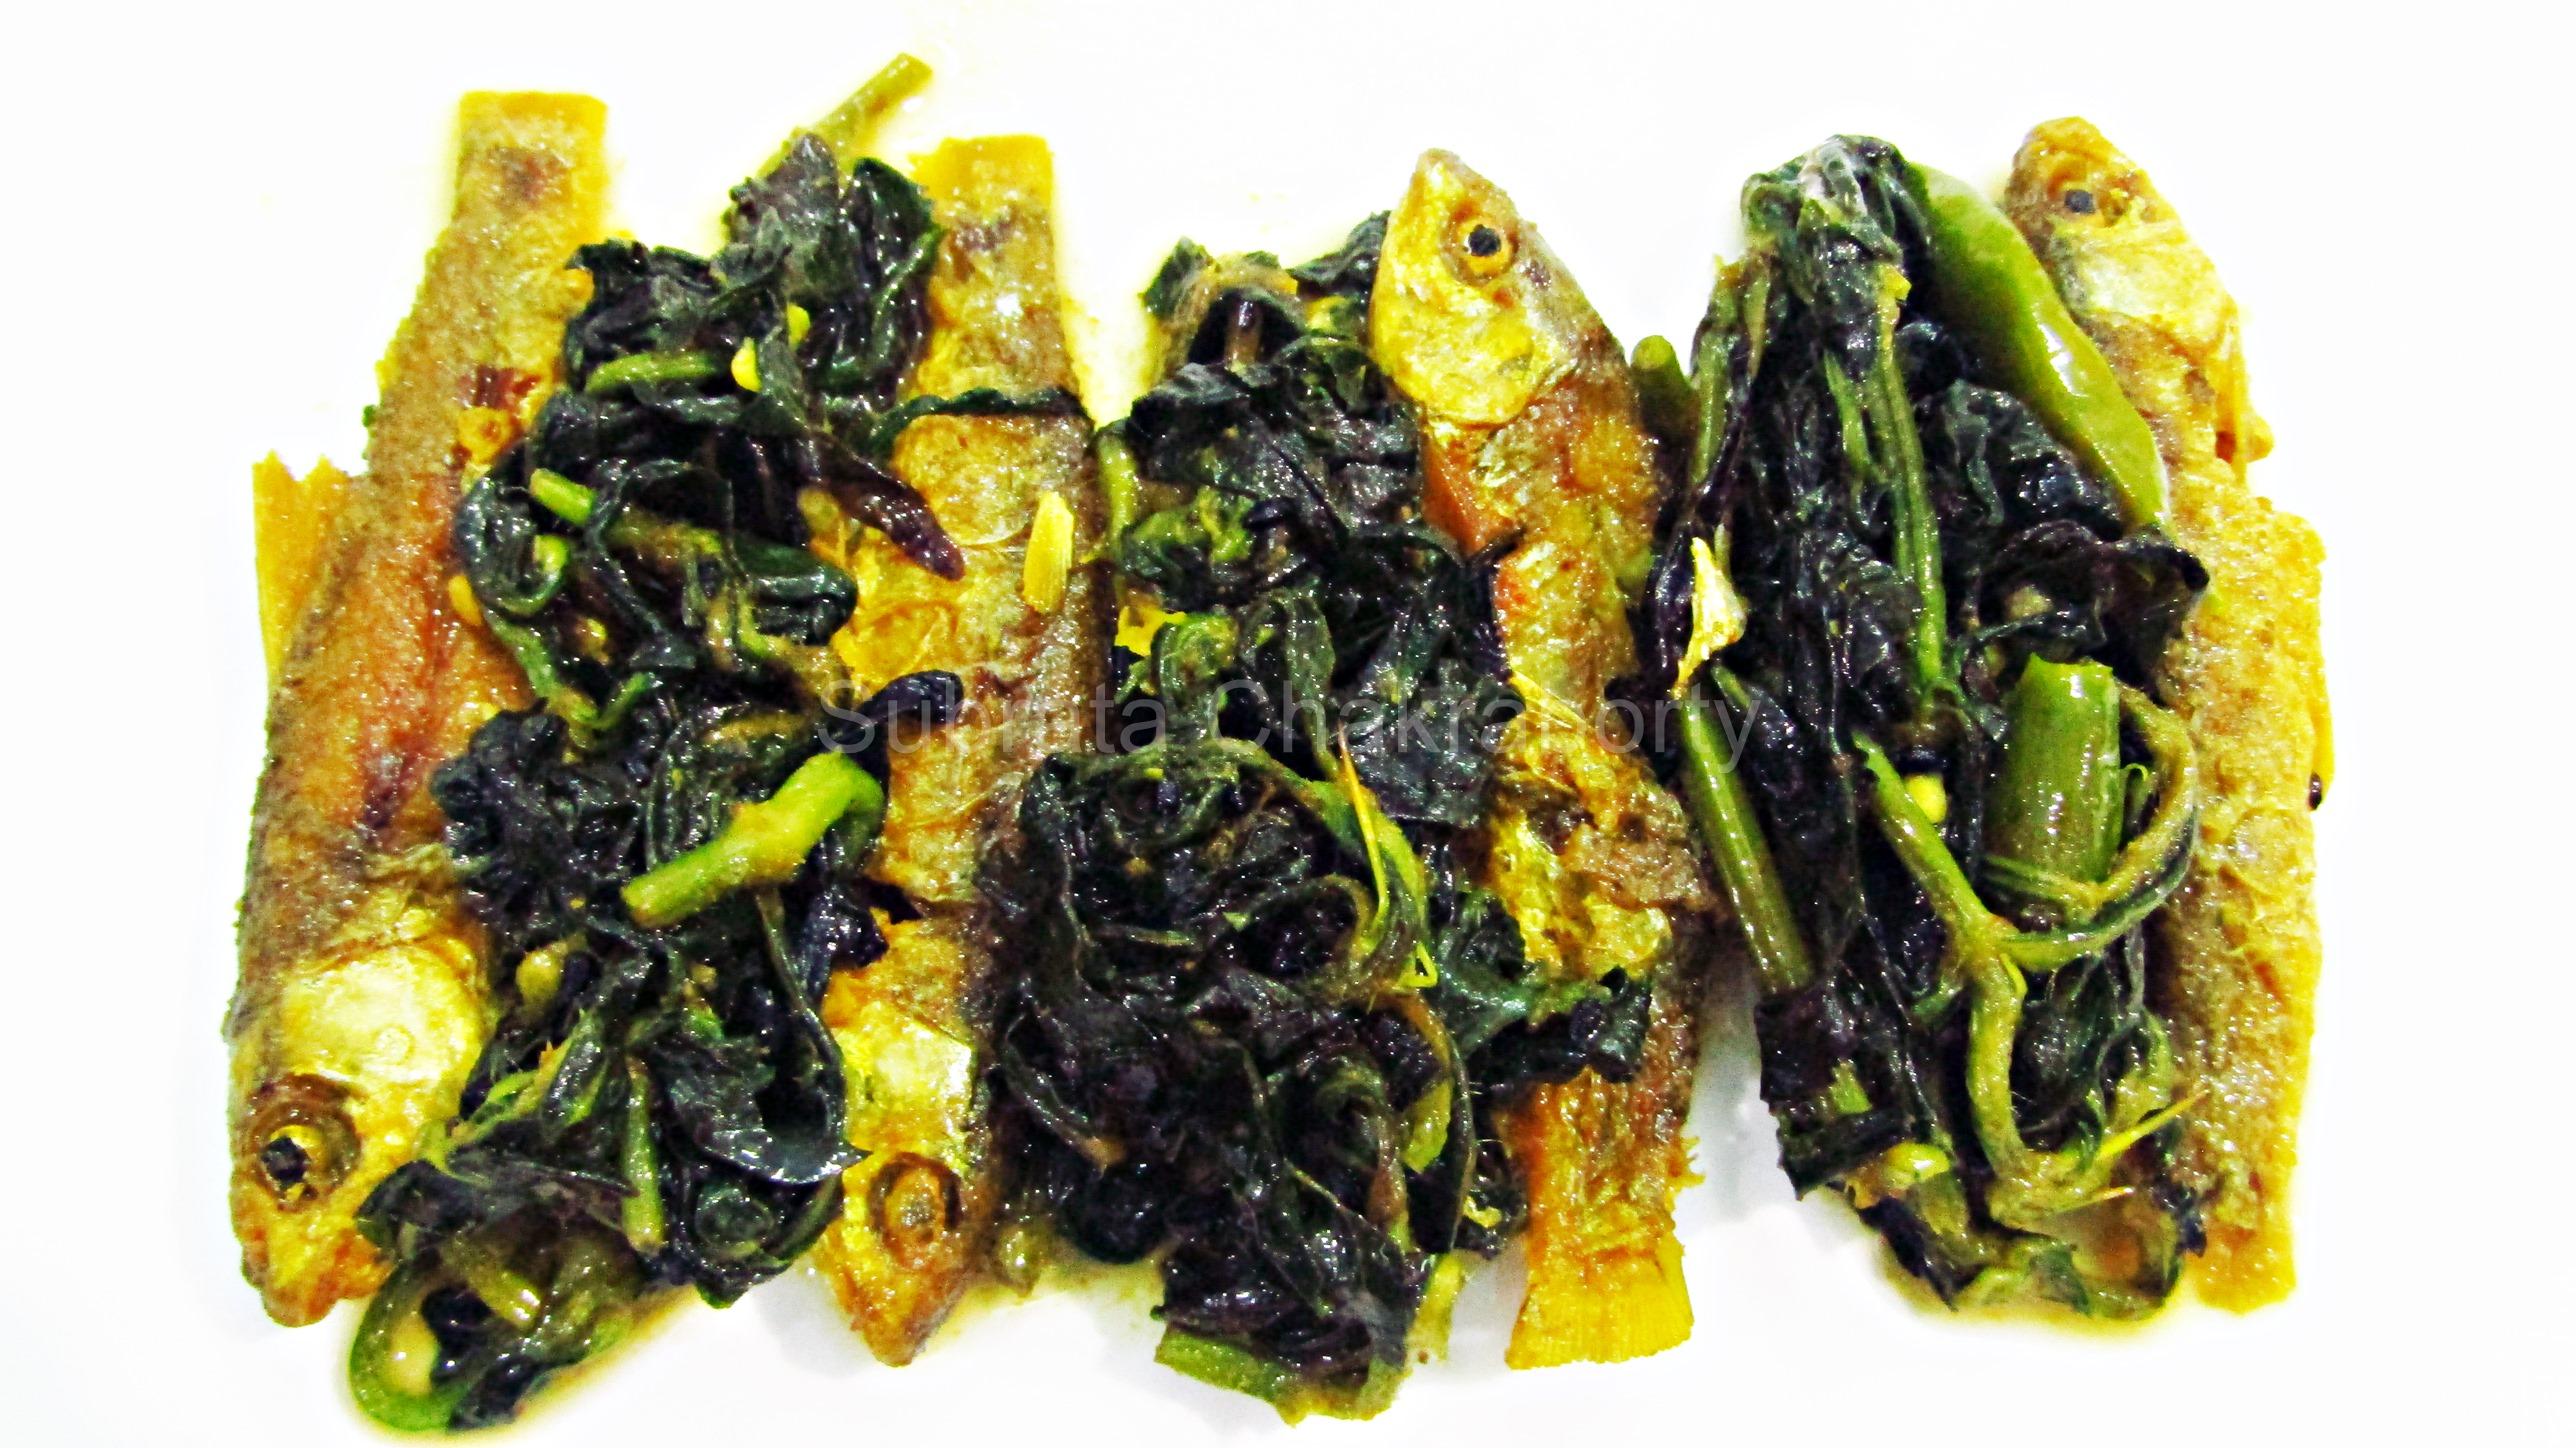 Kulekhara Bata from West Bengal, India | Best Indian Food Blog | Indian Swampweed Labeo Bata recipe